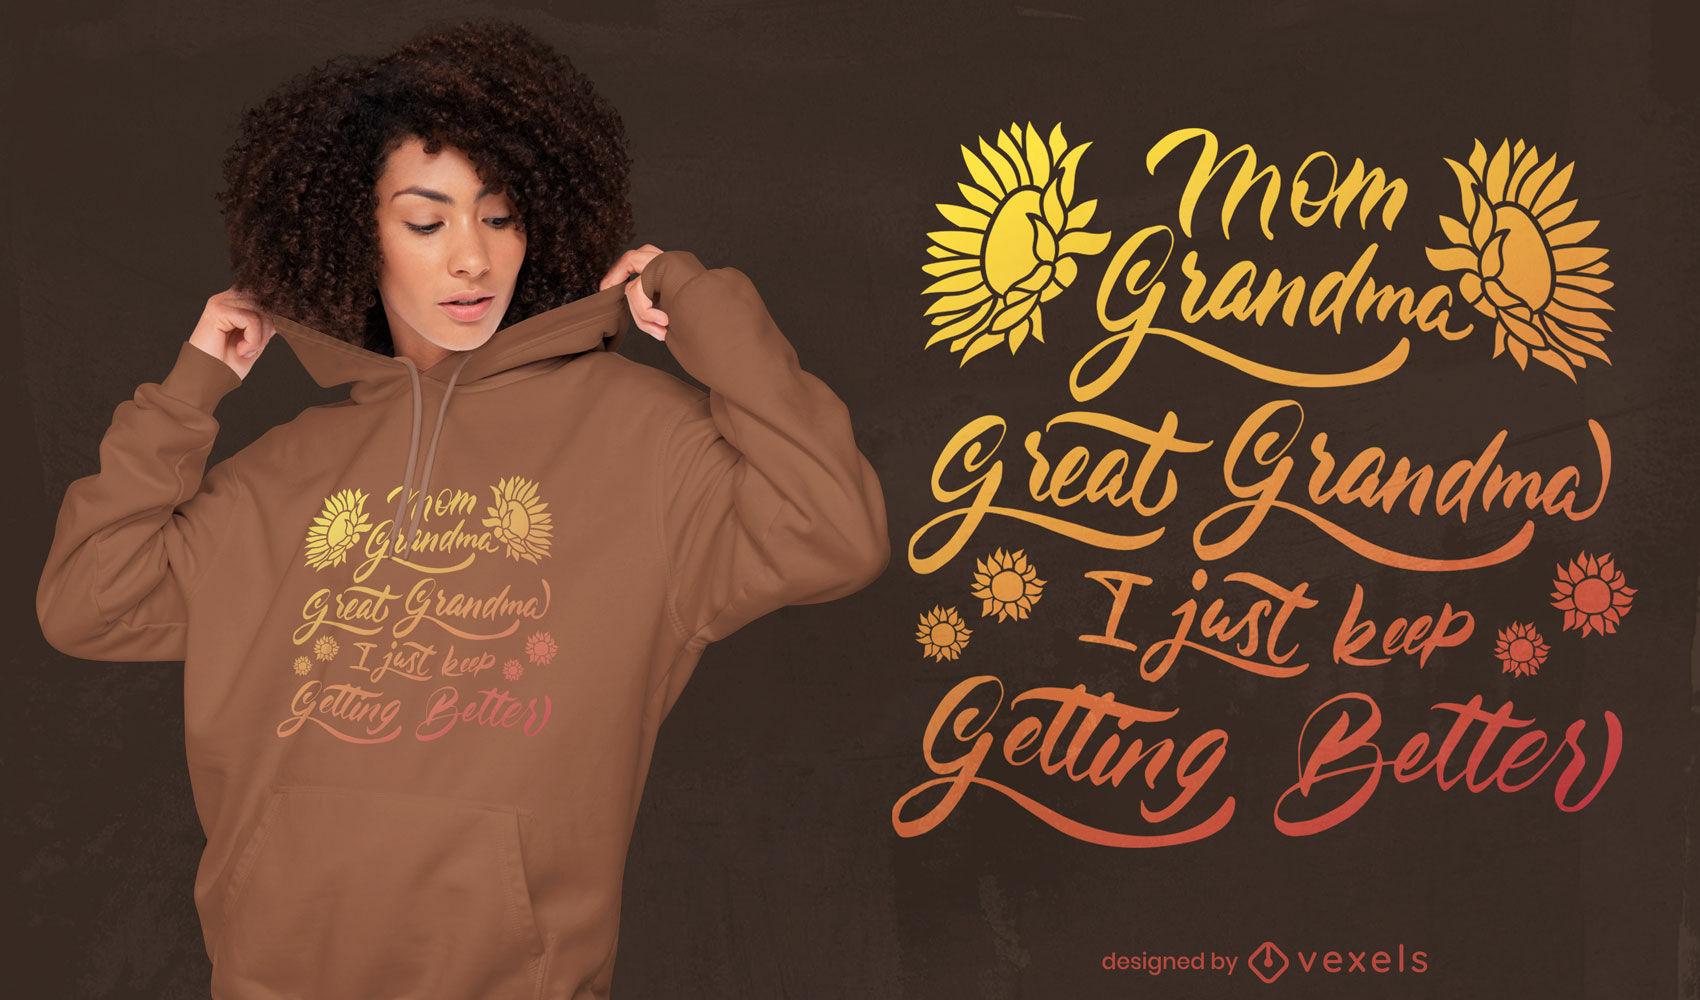 Grandma family funny quote t-shirt design